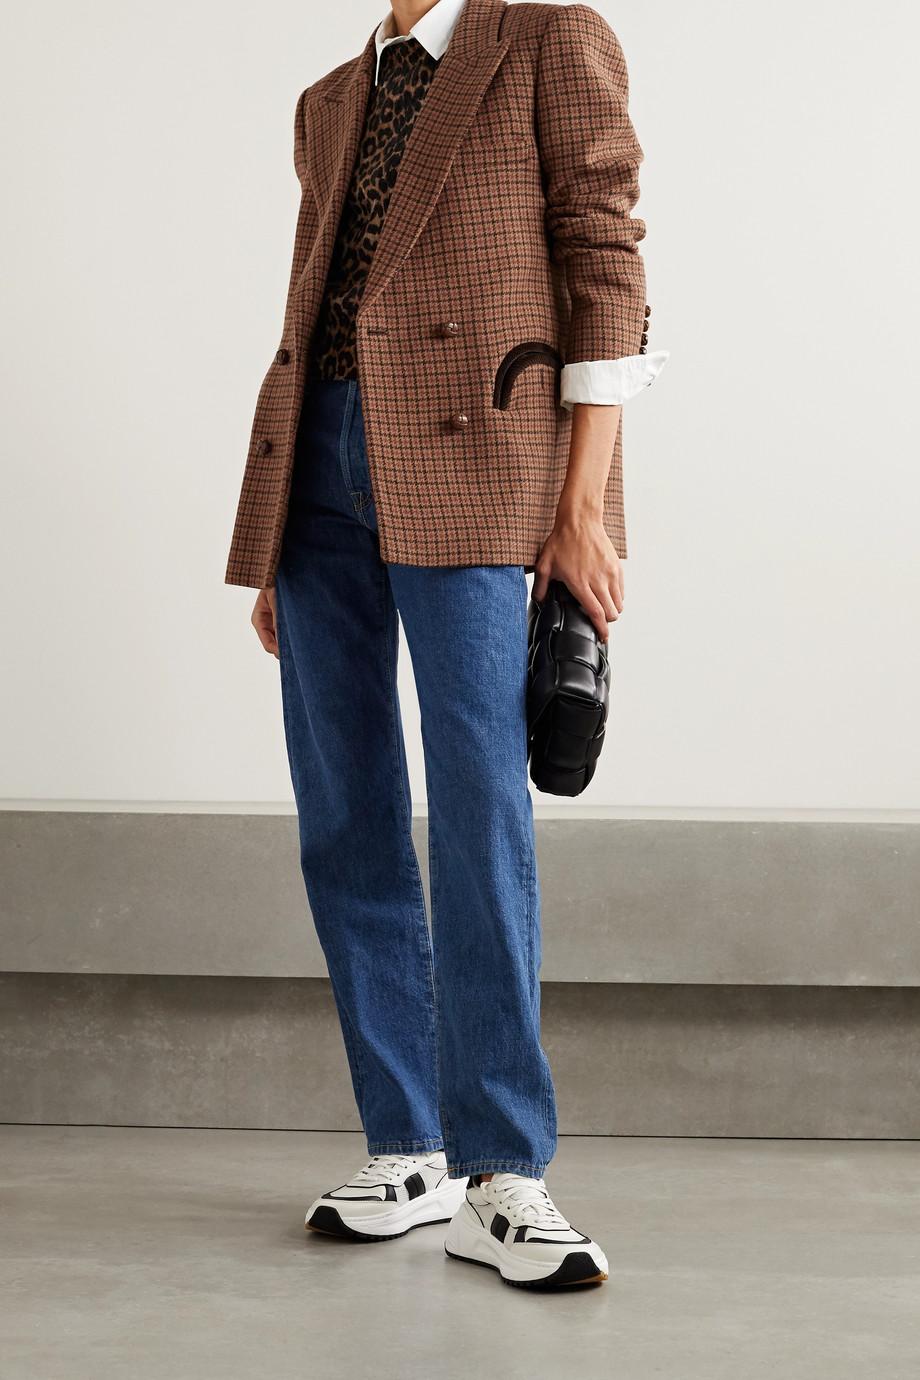 Blazé Milano Rembrandt Everynight 双排扣灯芯绒边饰格纹羊毛西装外套